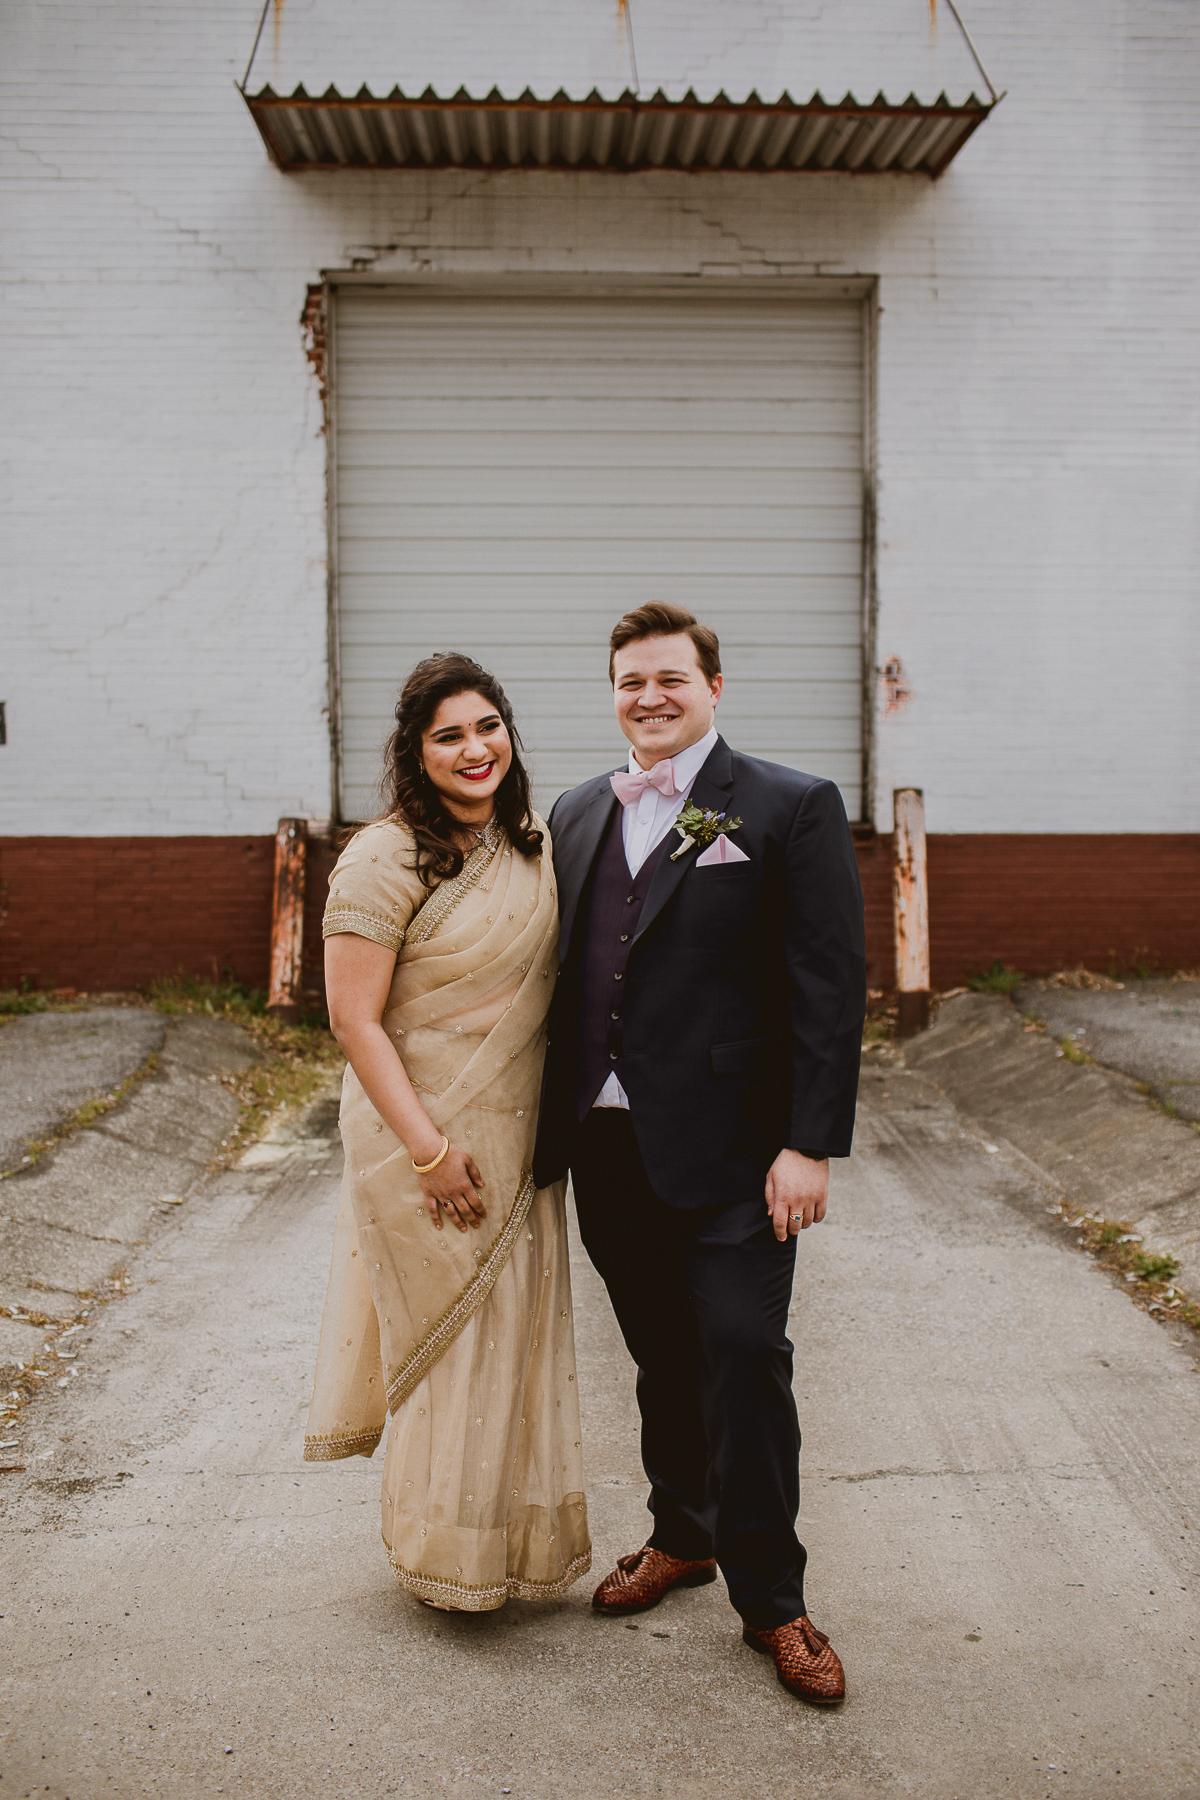 eventide-brewery-indian-american-fusion-kelley-raye-atlanta-los-angeles-wedding-photographer-14.jpg